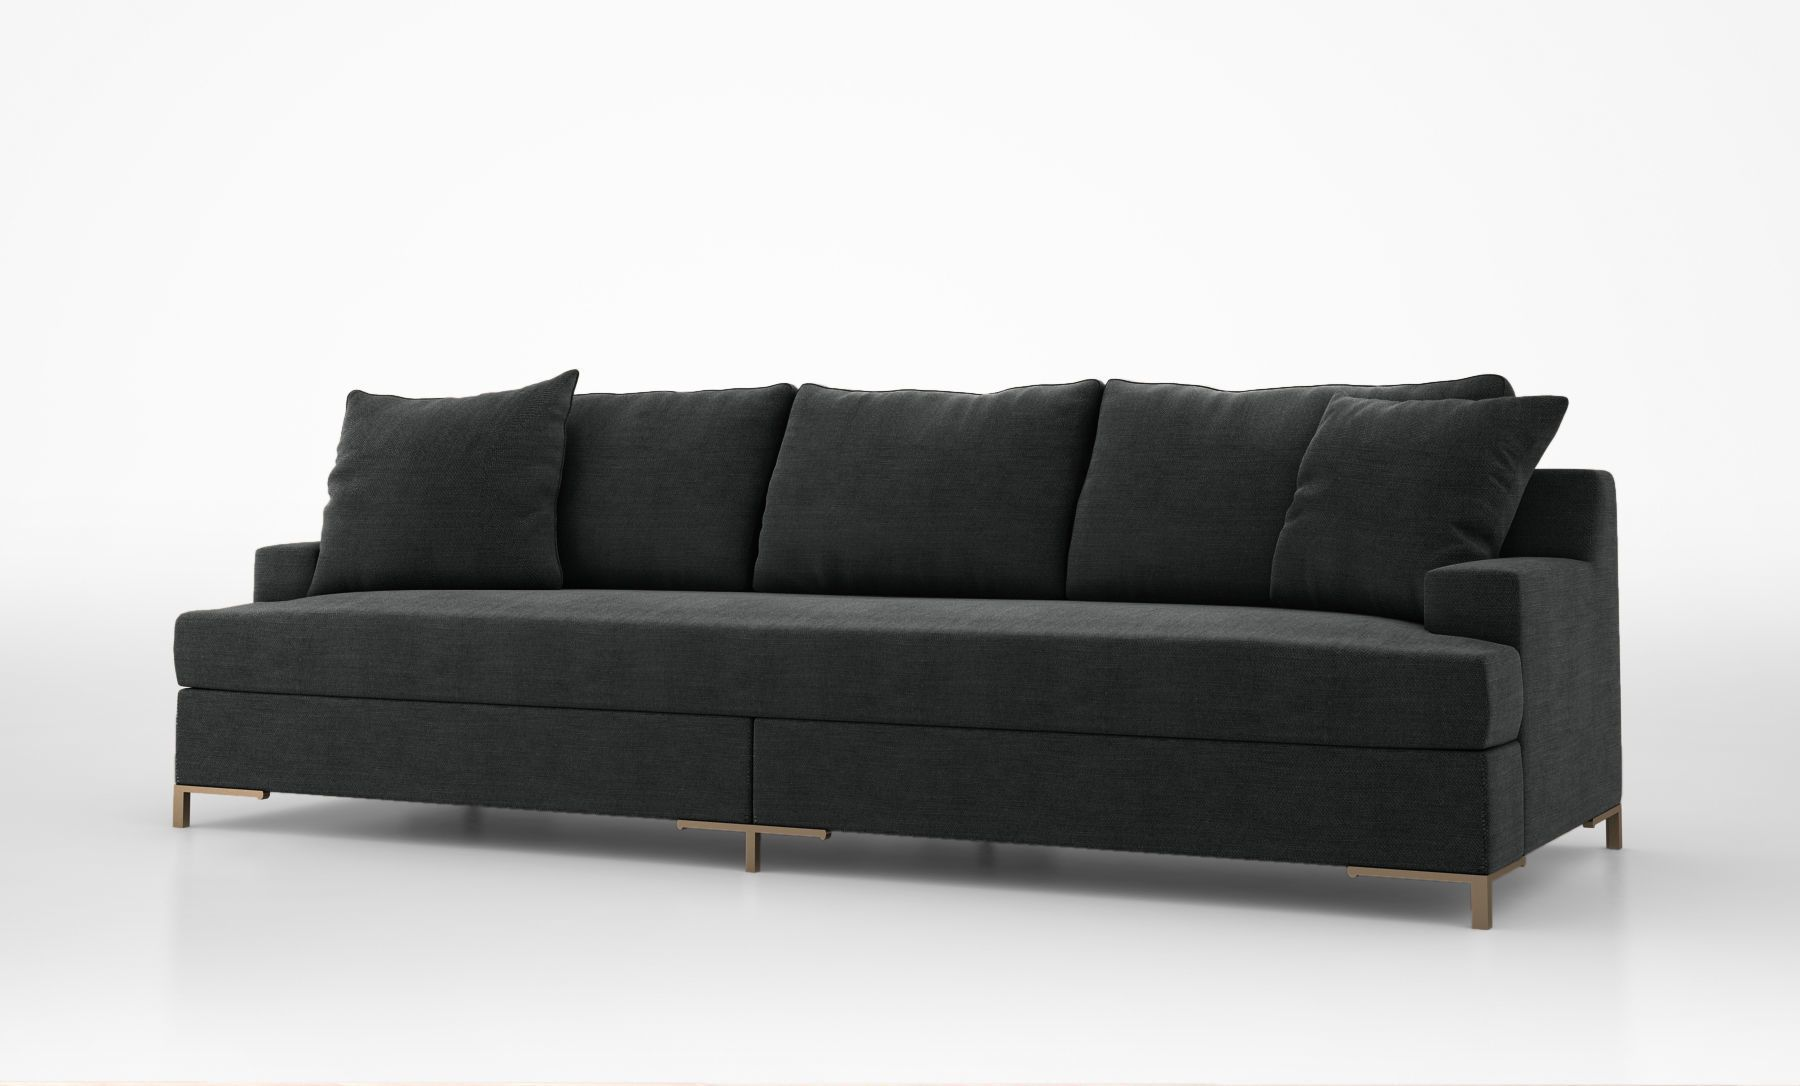 christian liaigre don juan sofa 3d model max obj 1800—1086